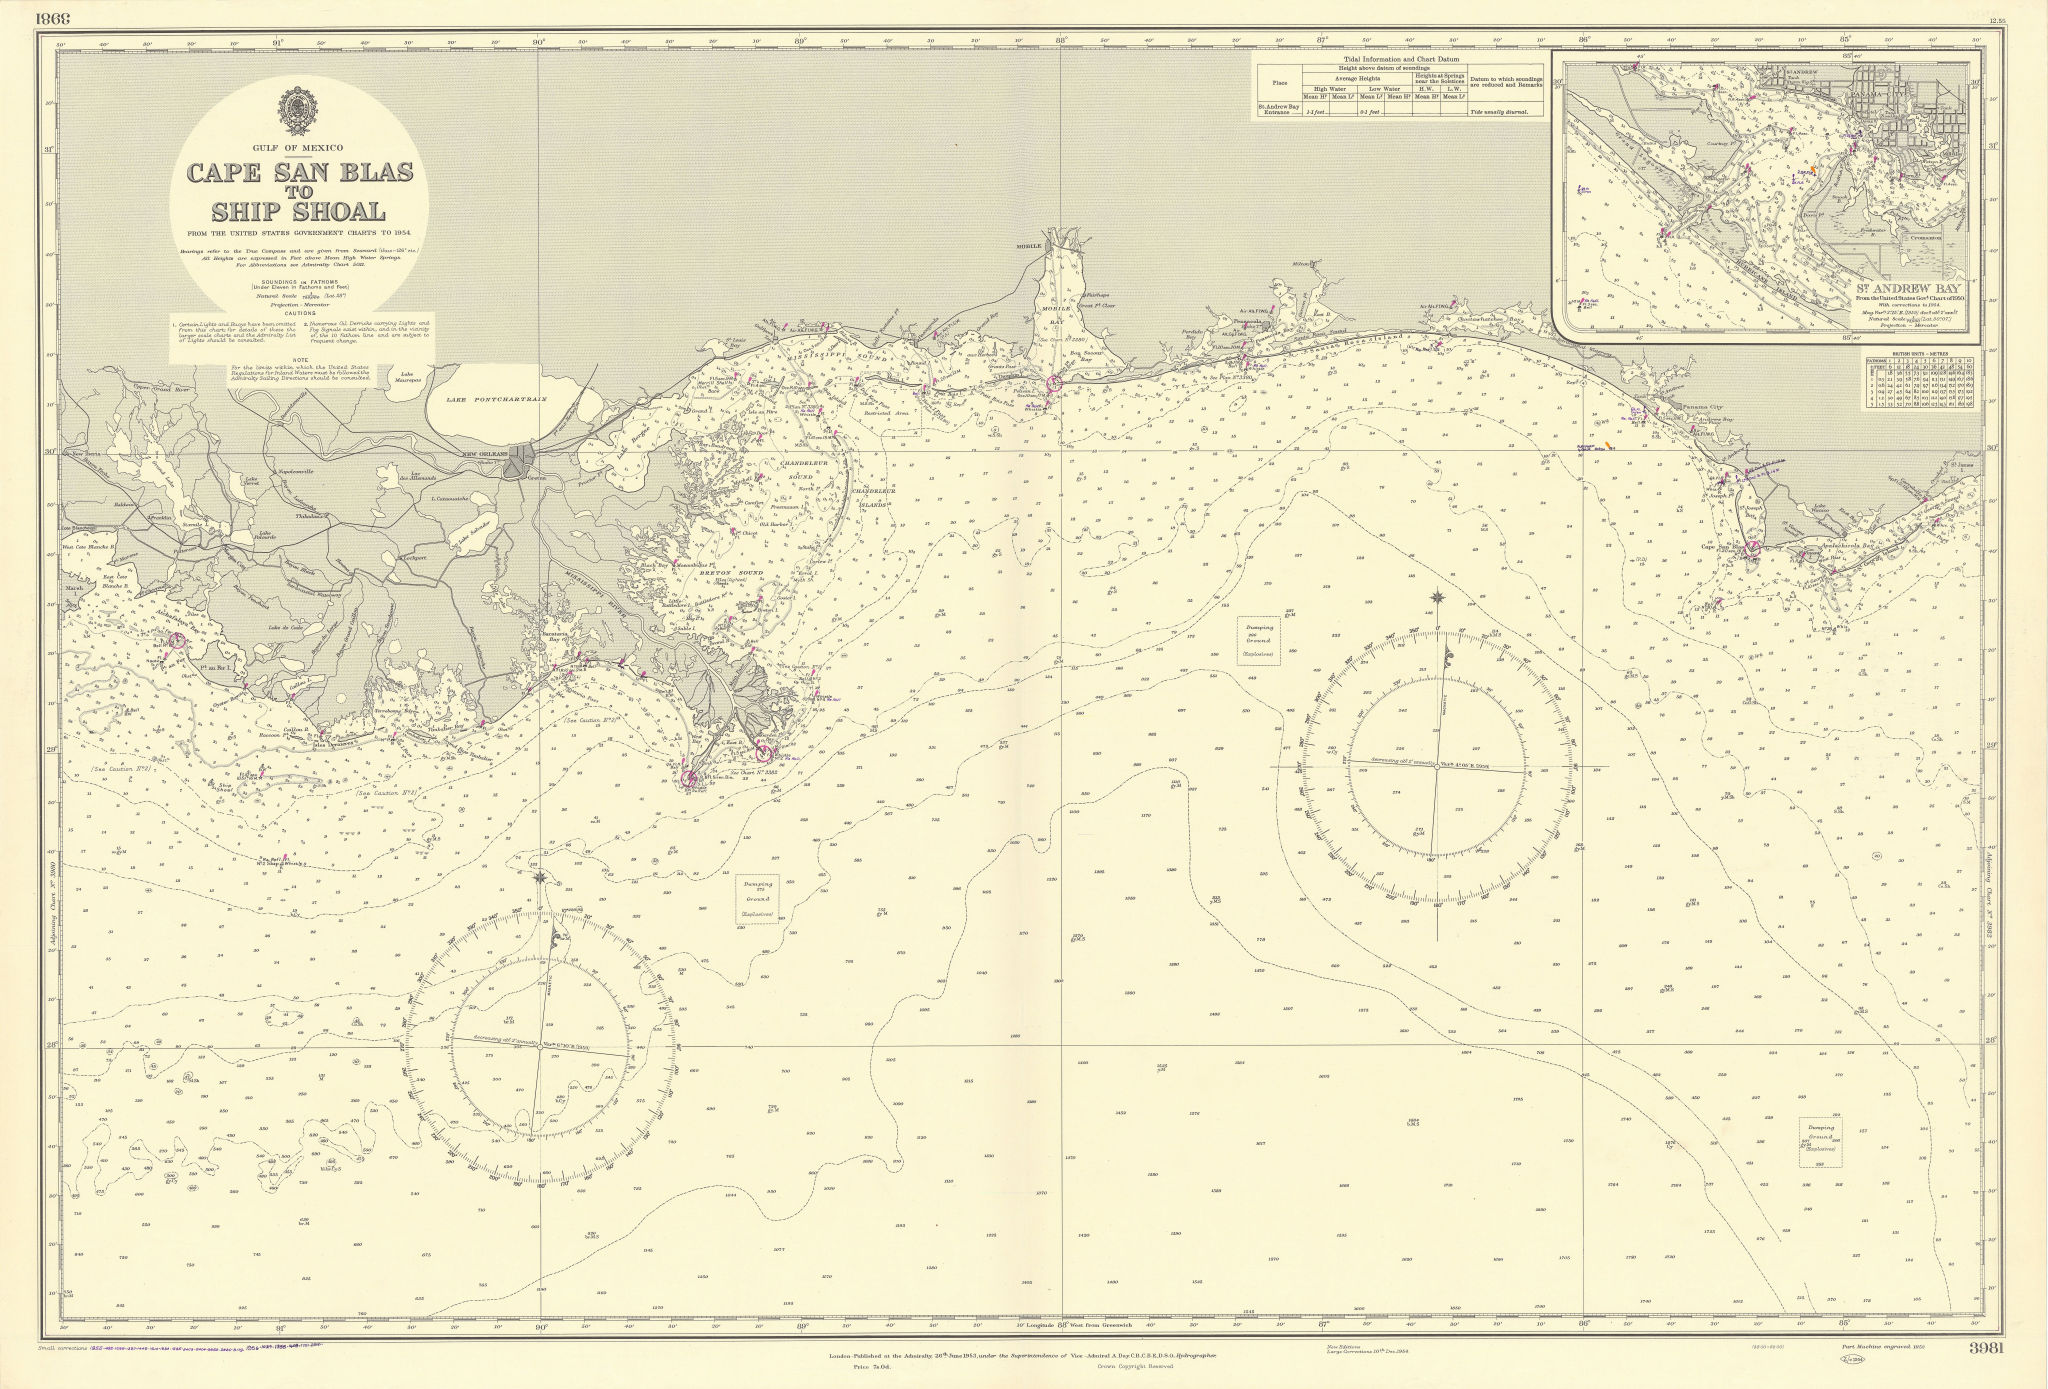 Louisiana Alabama Florida Gulf of Mexico ADMIRALTY sea chart 1953 (1956) map